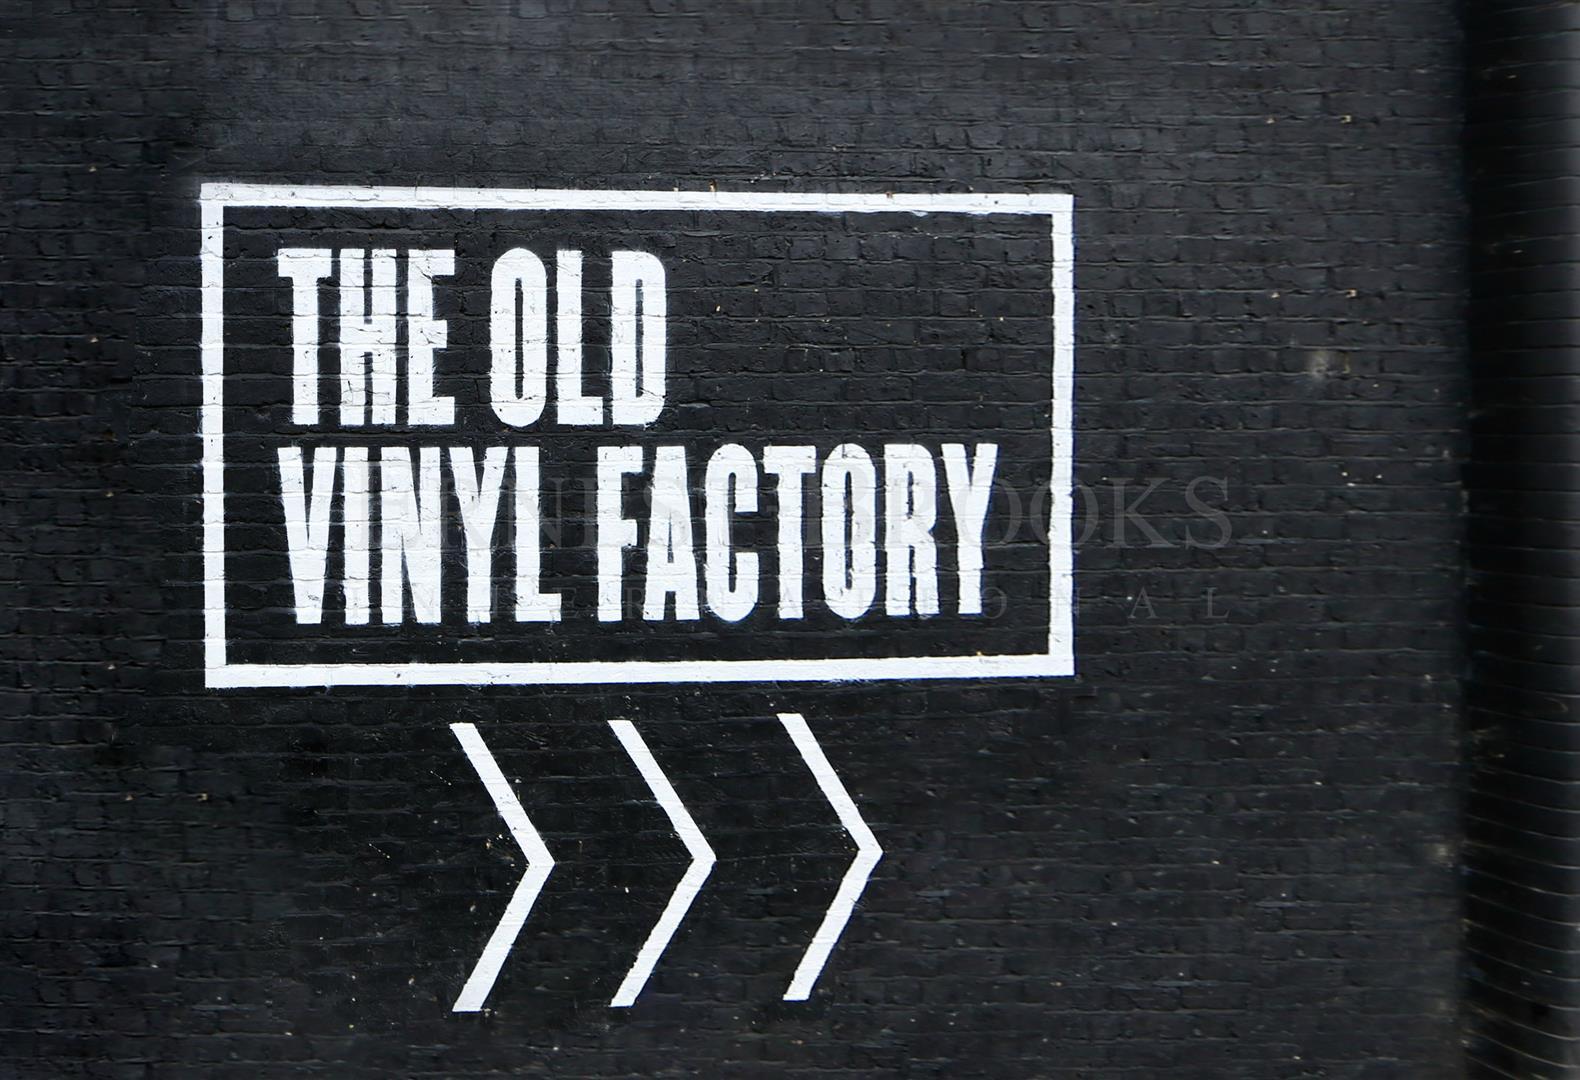 Old Vinyl Factory,Front Elevation